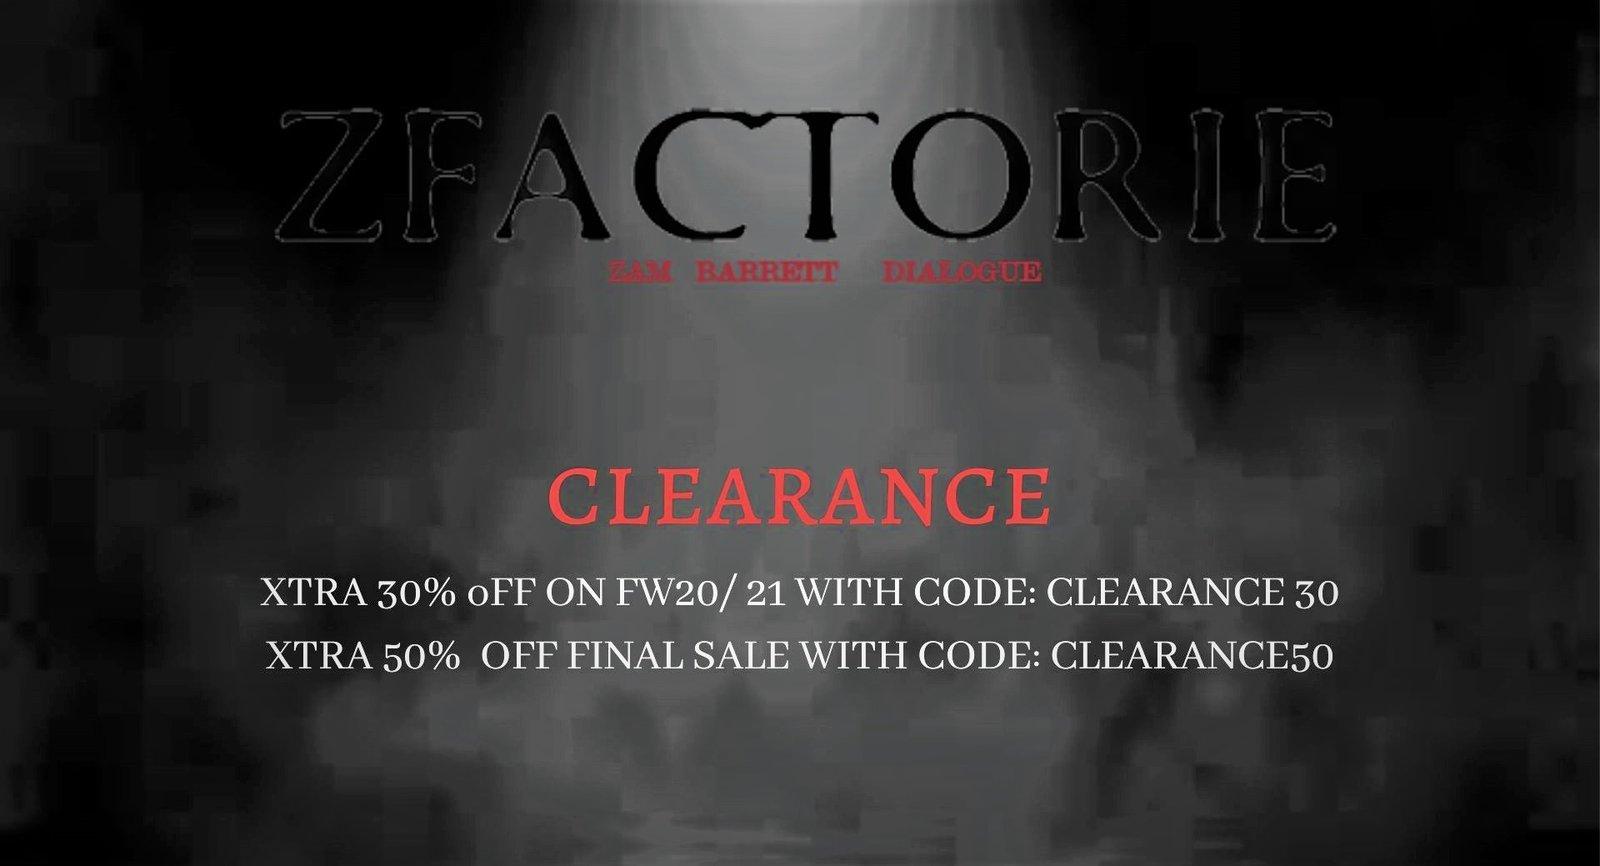 clearance 30 -50.jpg